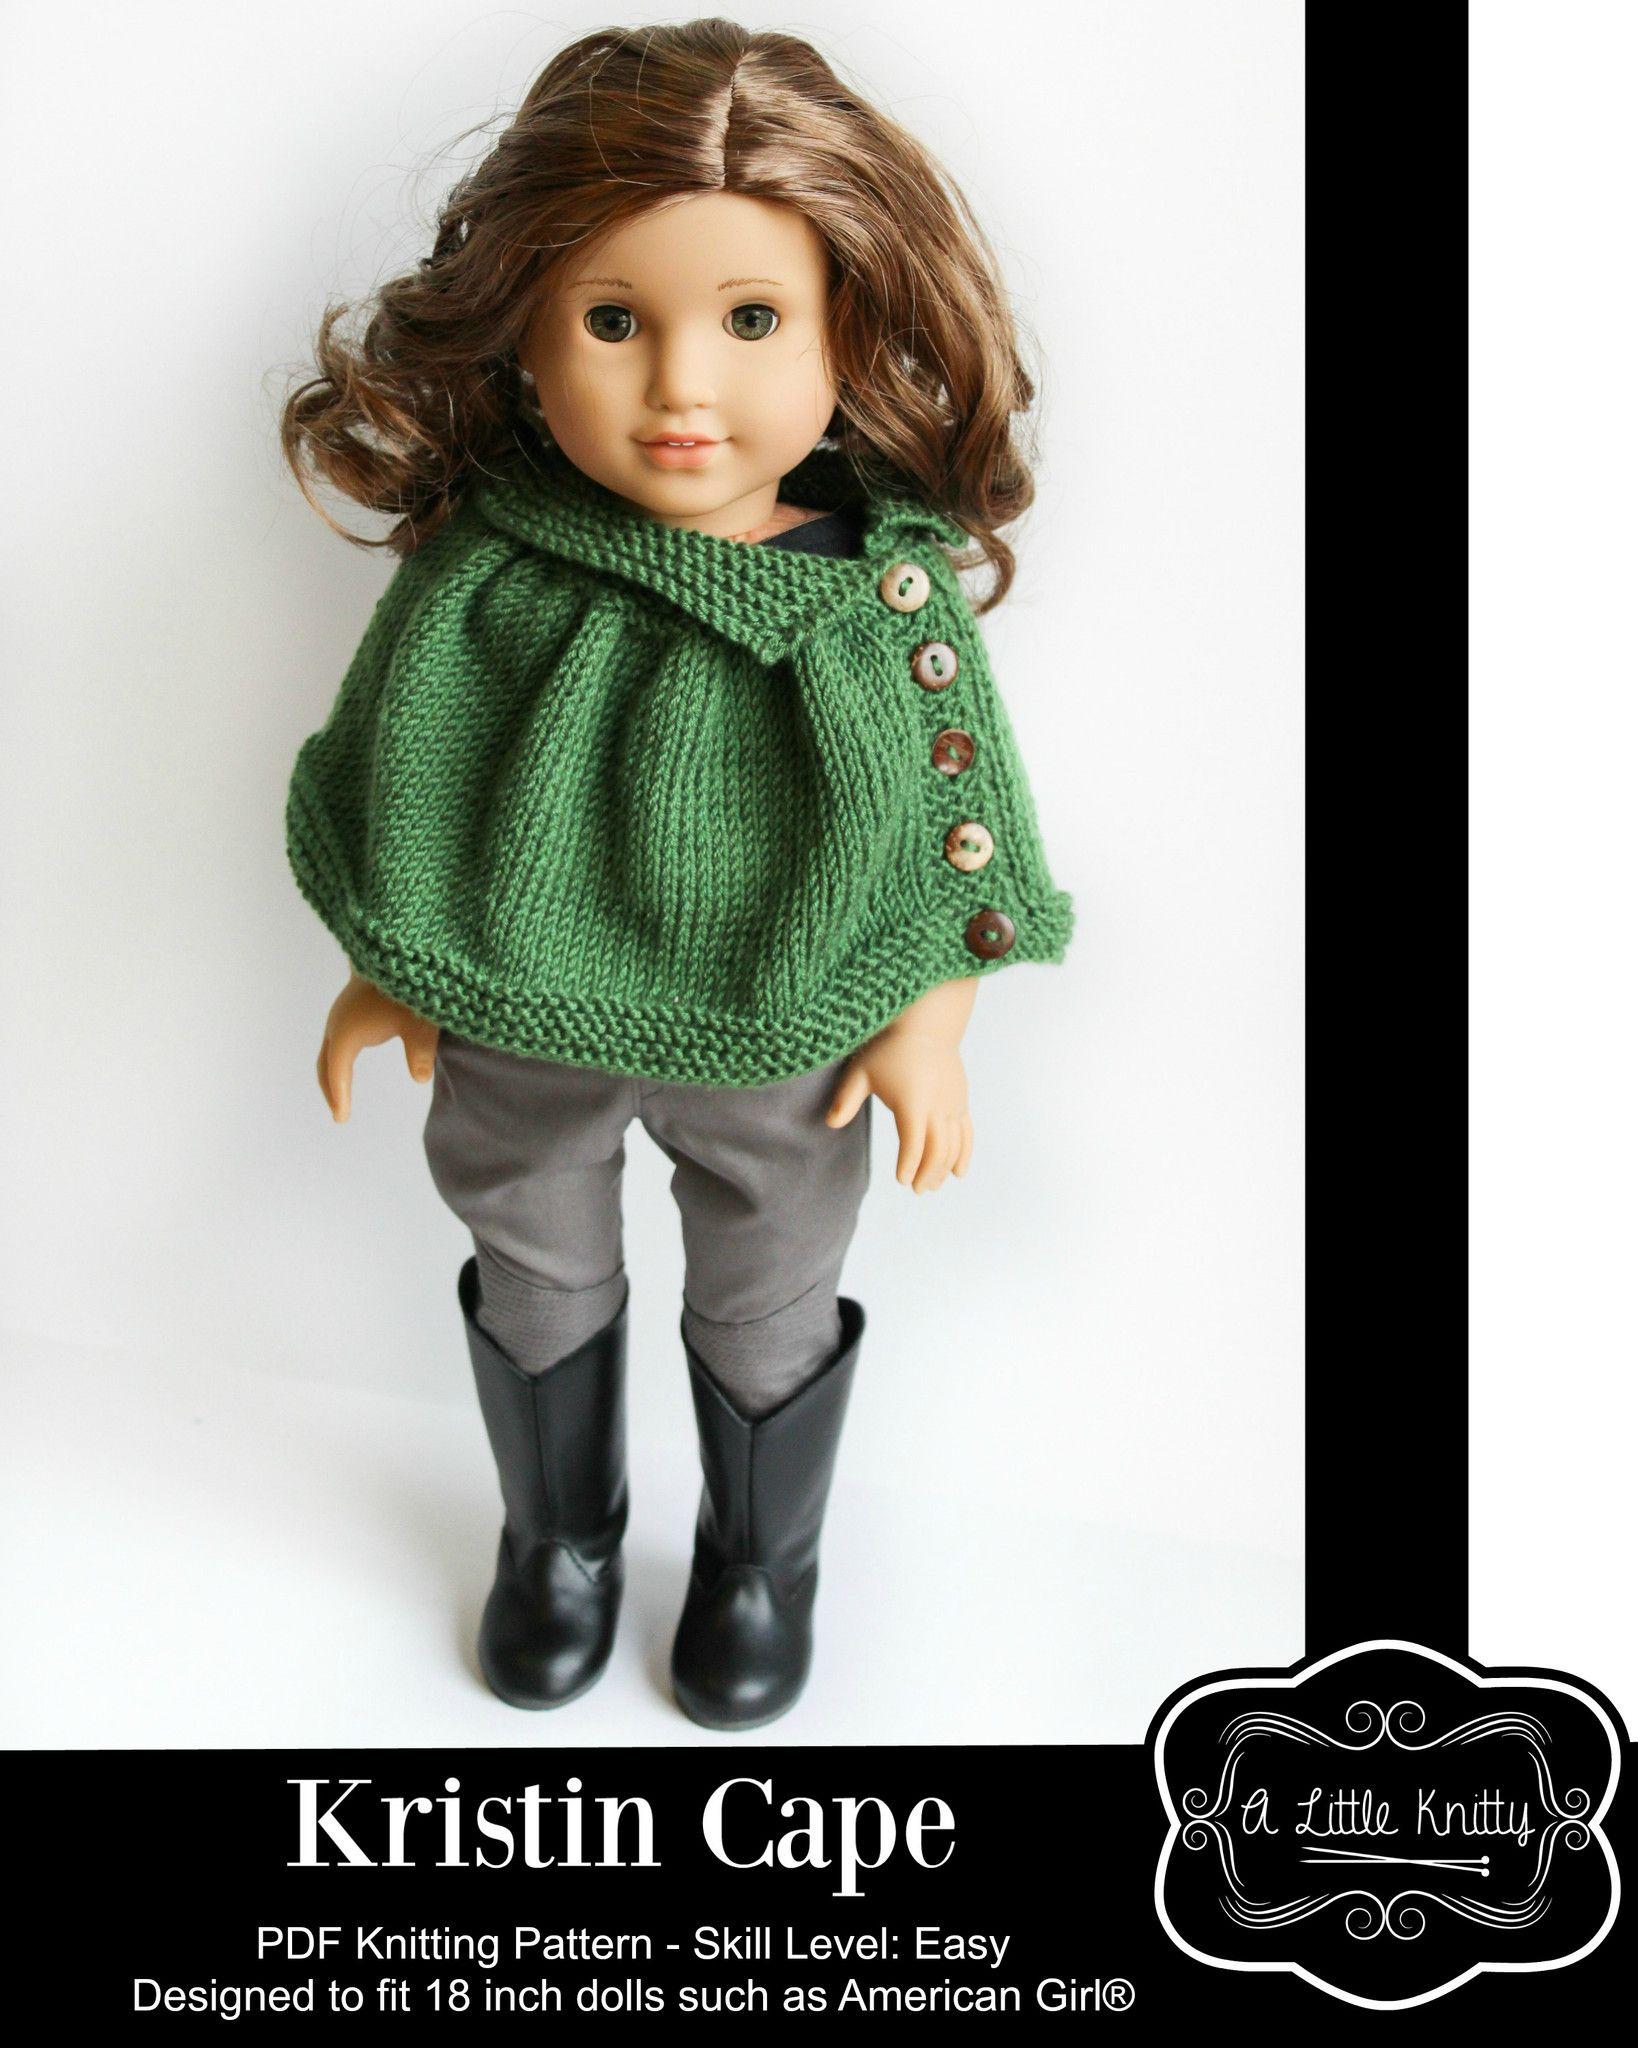 Kristin cape knitting pattern knitting patterns sport weight kristin cape knitting pattern bankloansurffo Gallery